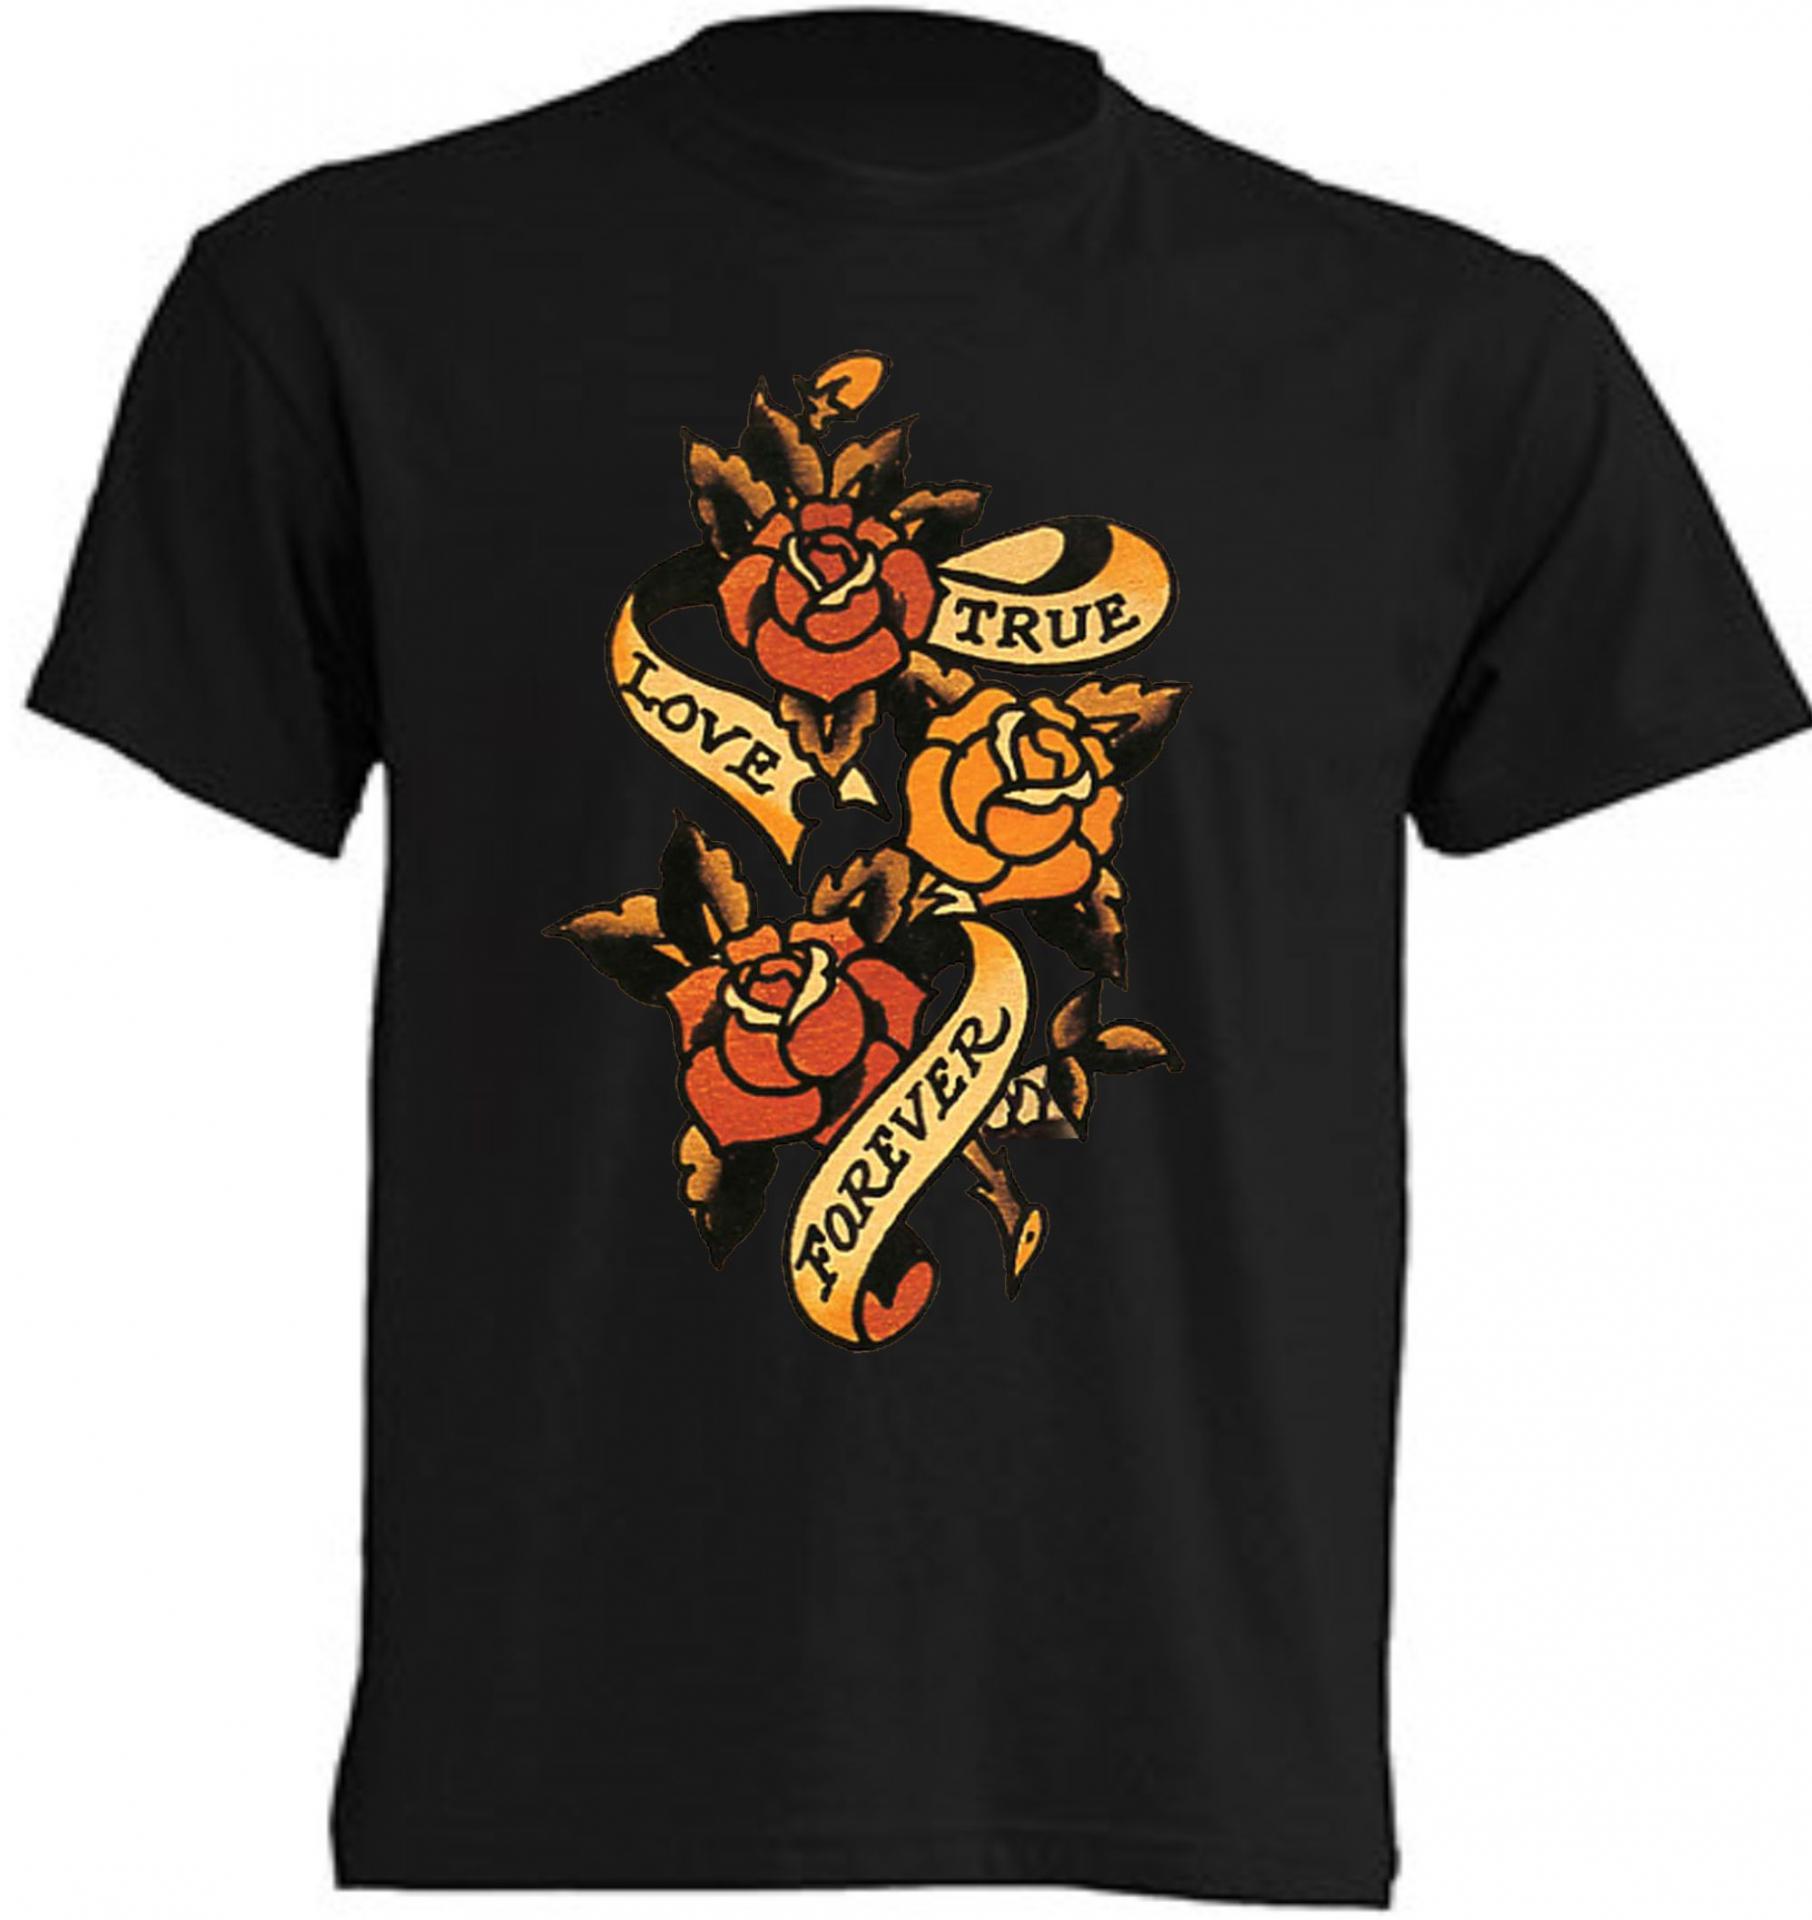 Camiseta True Love Forever